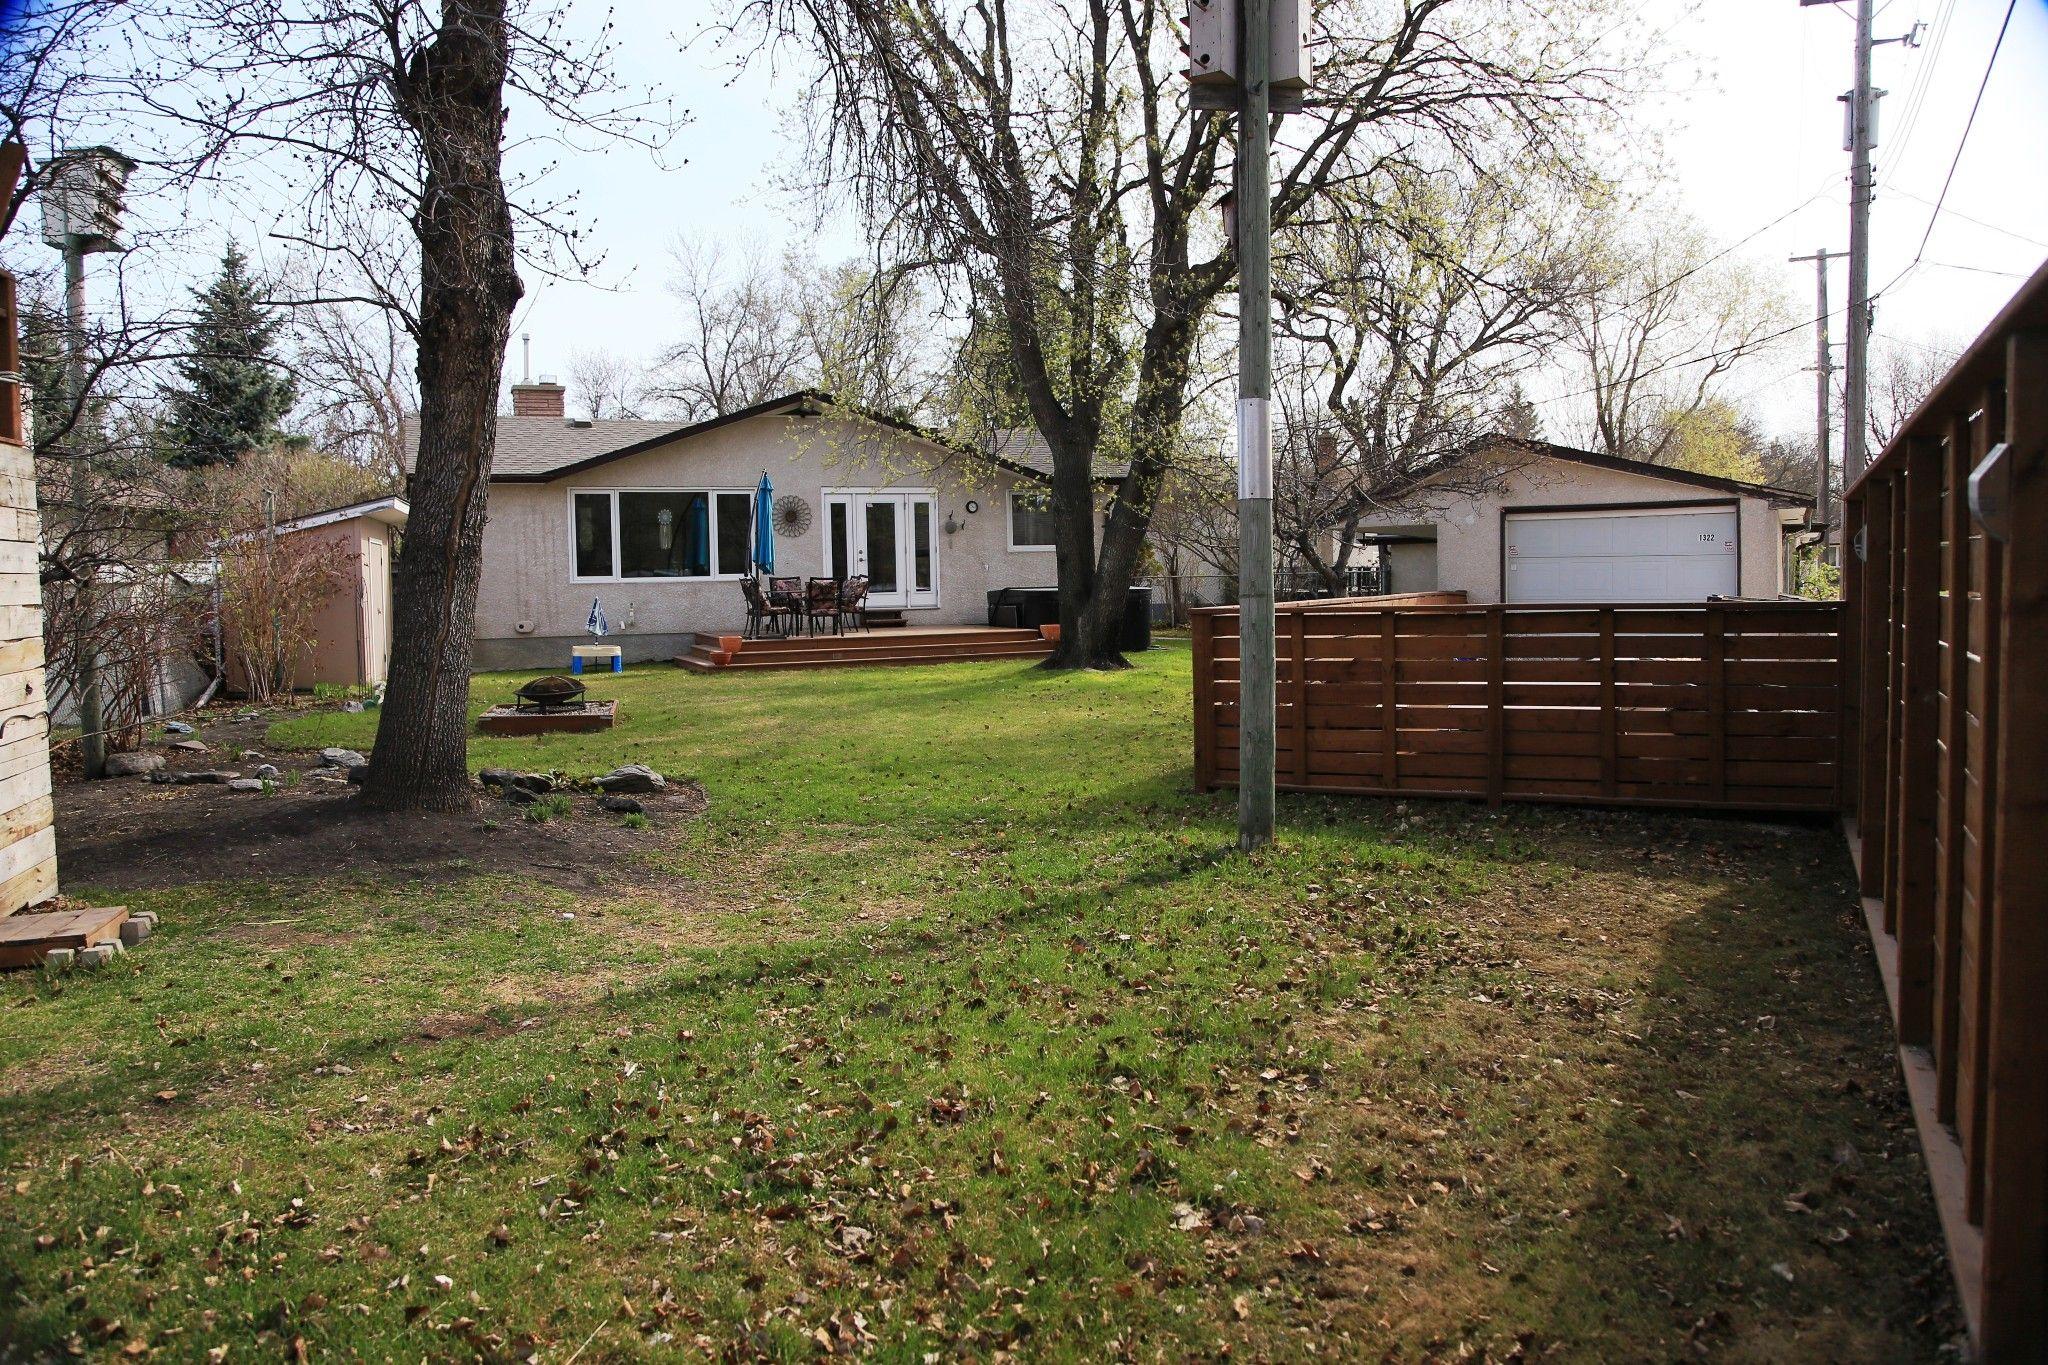 Photo 6: Photos: 1322 Valour Road in Winnipeg: Sargent Park Single Family Detached for sale (5C)  : MLS®# 1811835